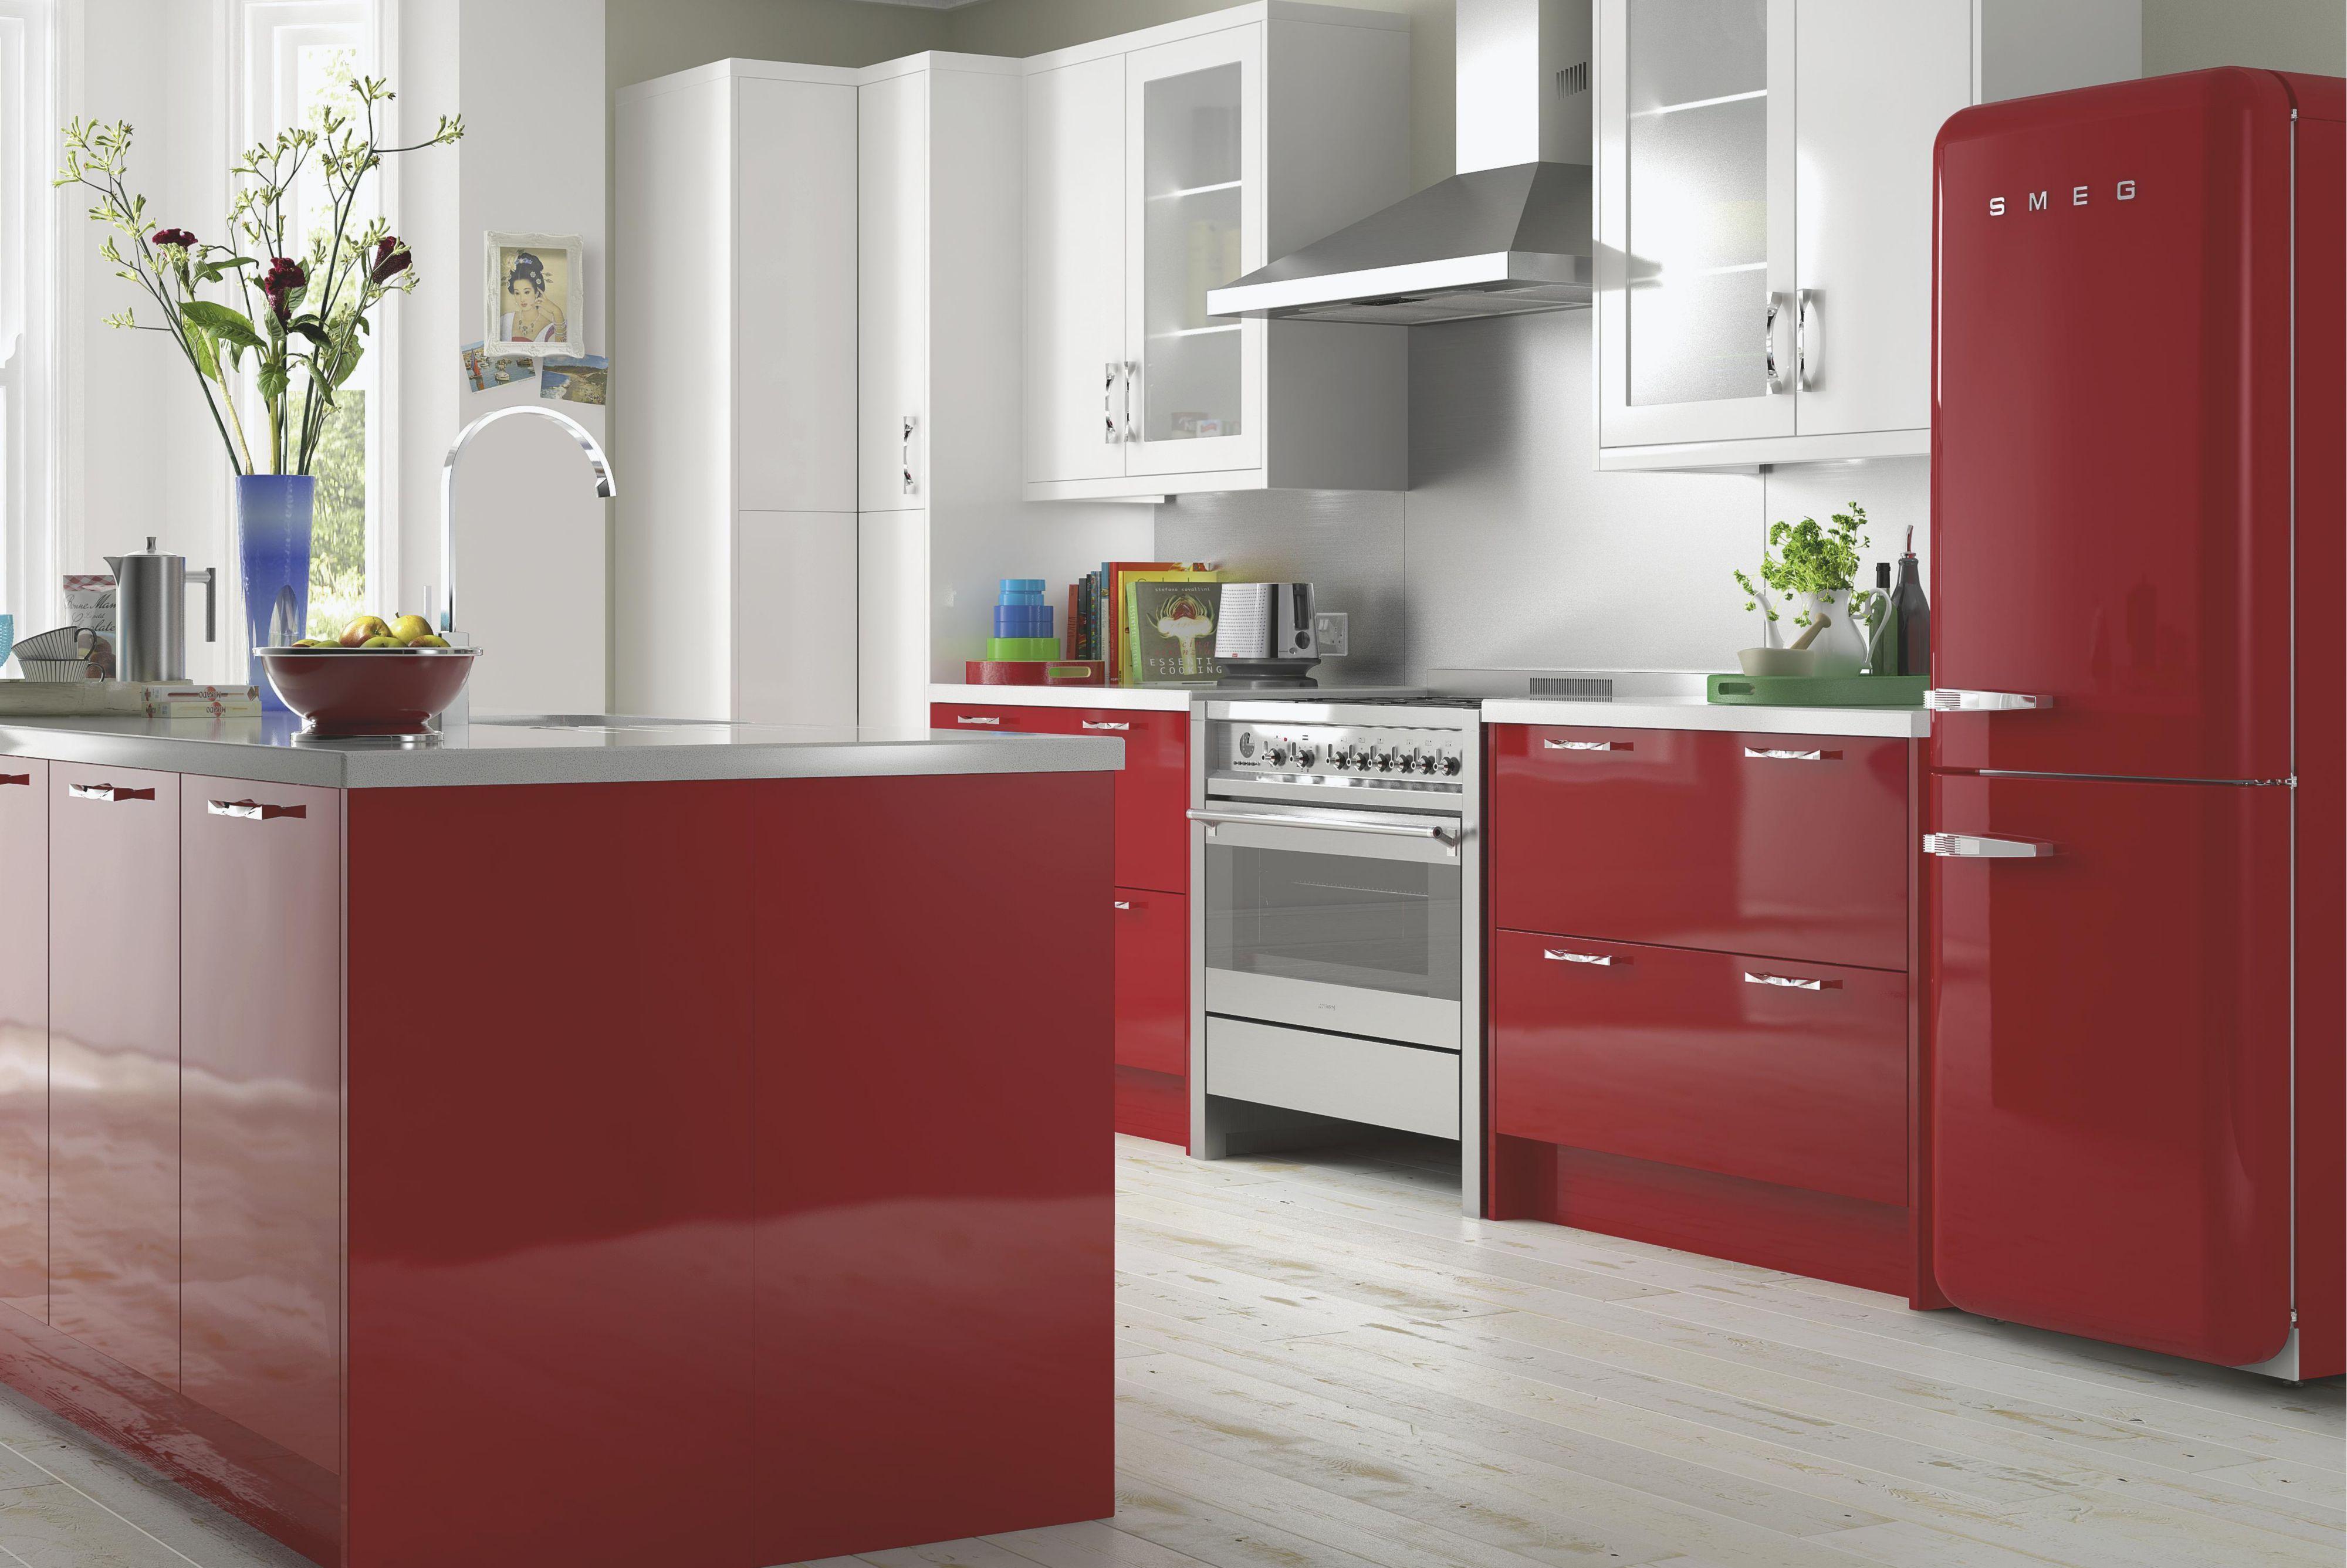 Lovely B&q Kitchen Appliances